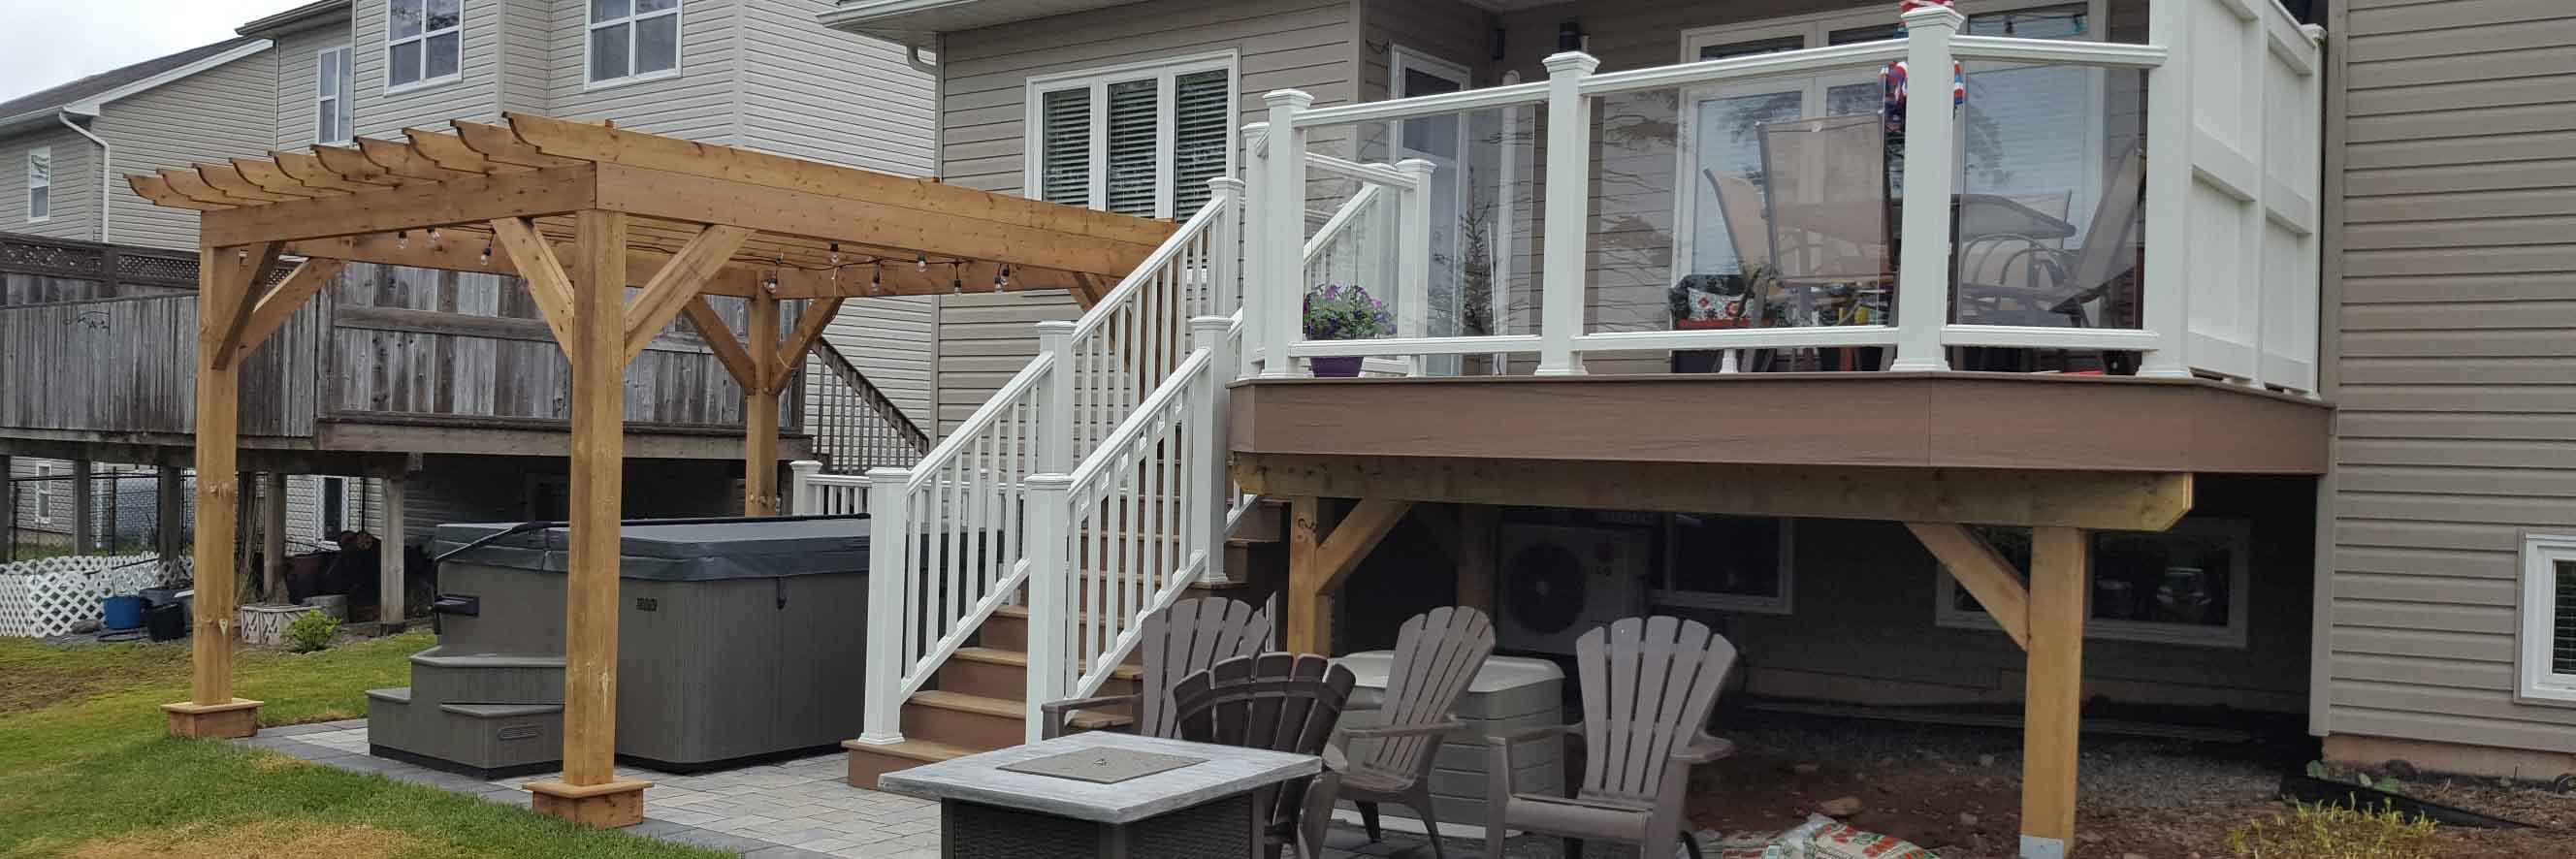 Deck Building in Halifax Nova Scotia | All-Craft Decks & Sunrooms